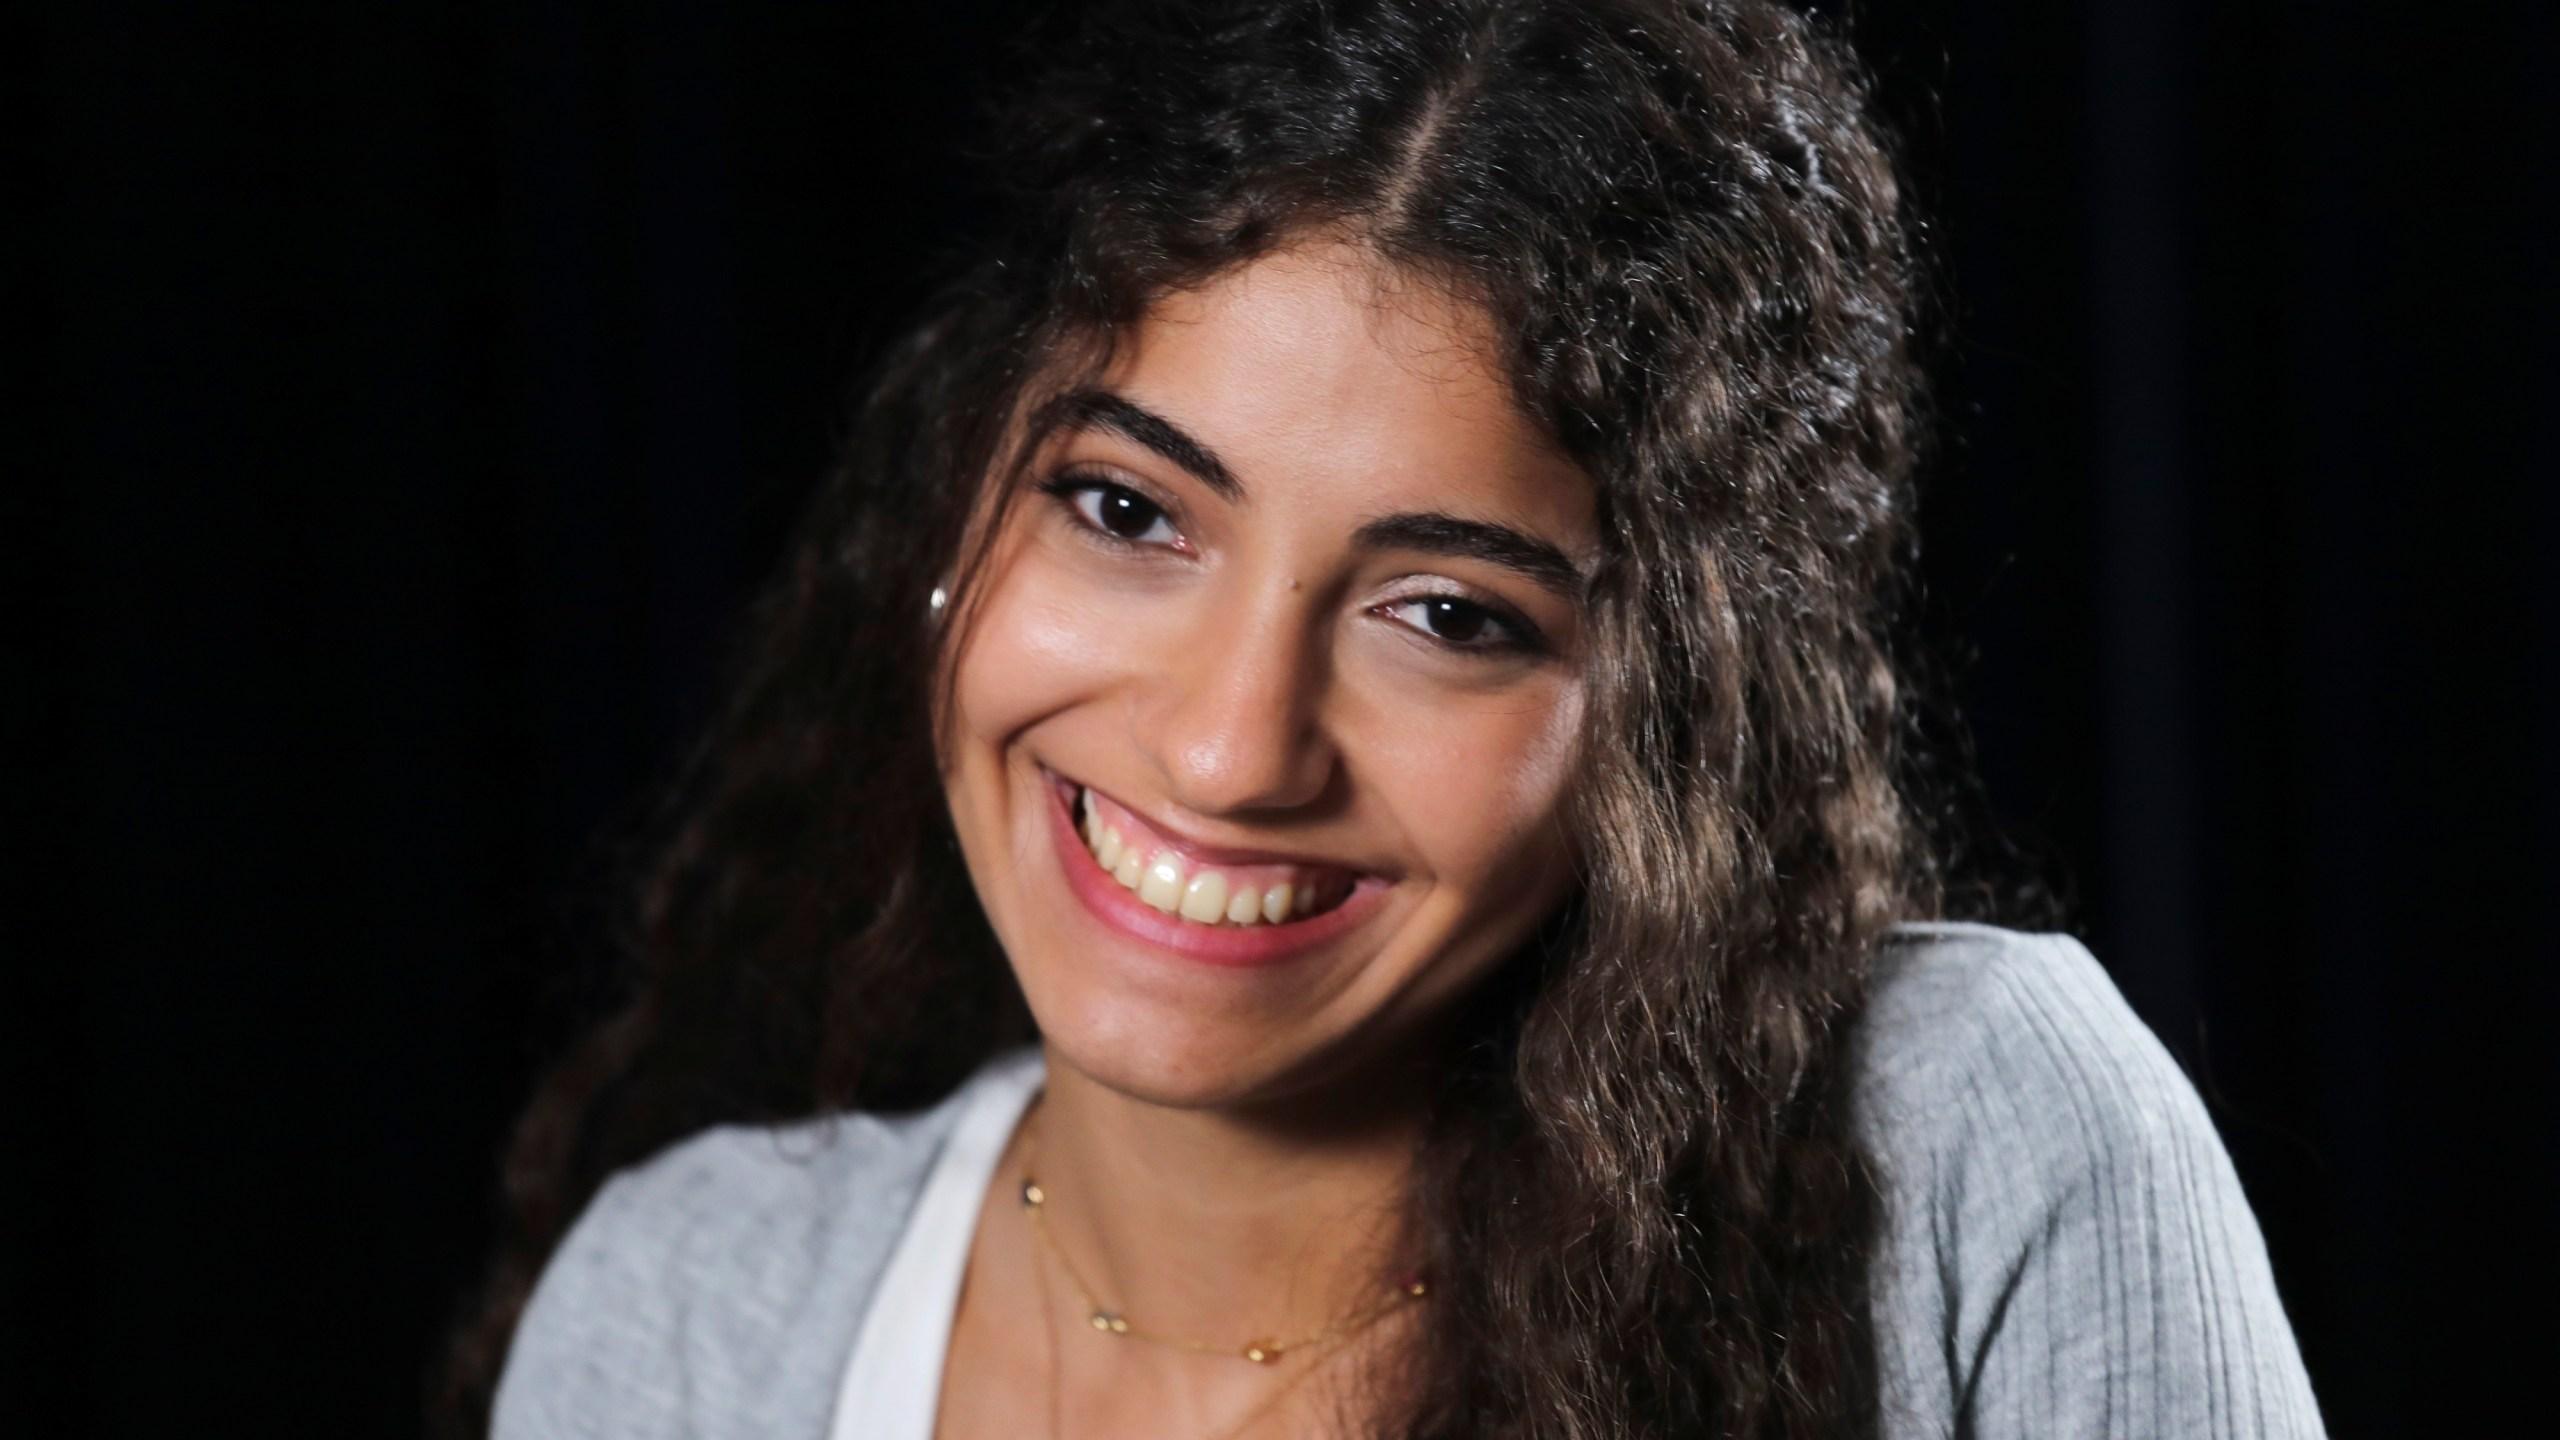 Nour Ardakani